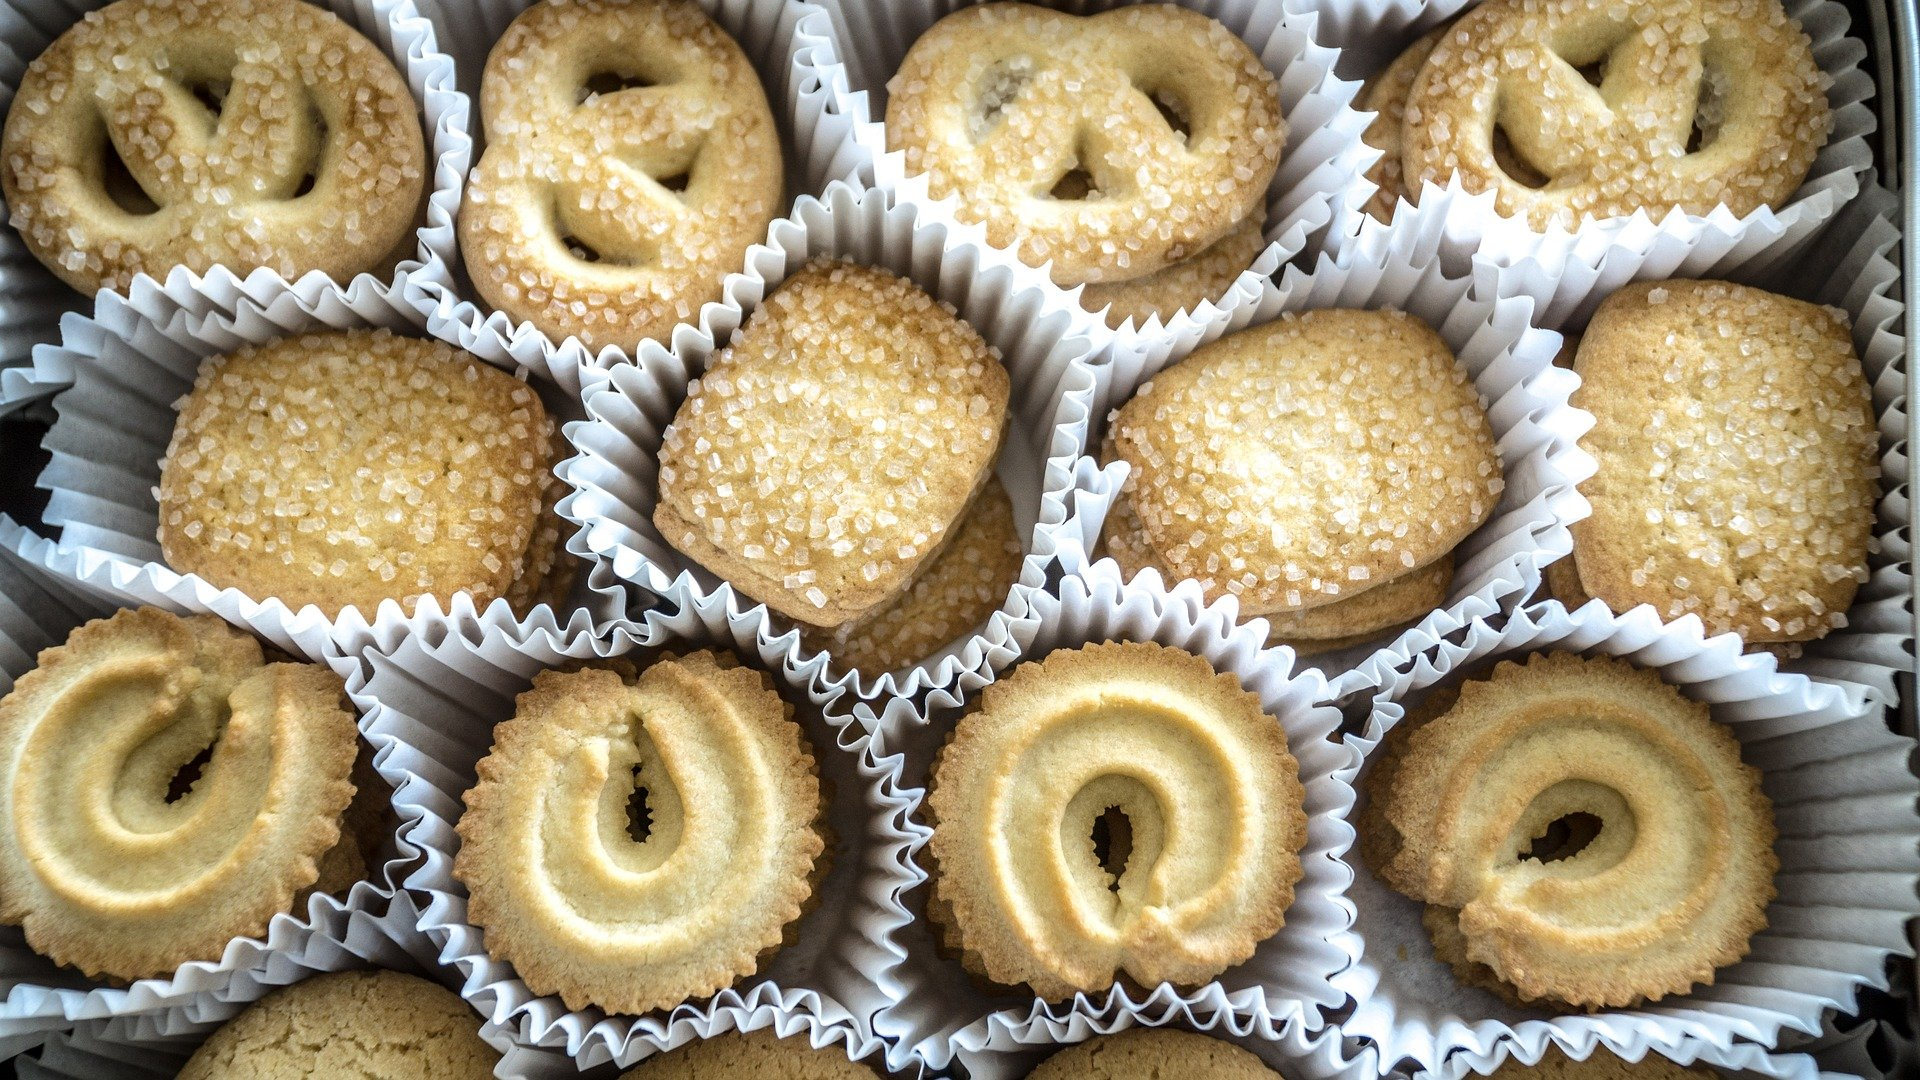 christmas, europe, baking, cookies, table, jam, sugar, festive, vaniljekranse,table, scandinavia, butter, cookies, vanilla, vani